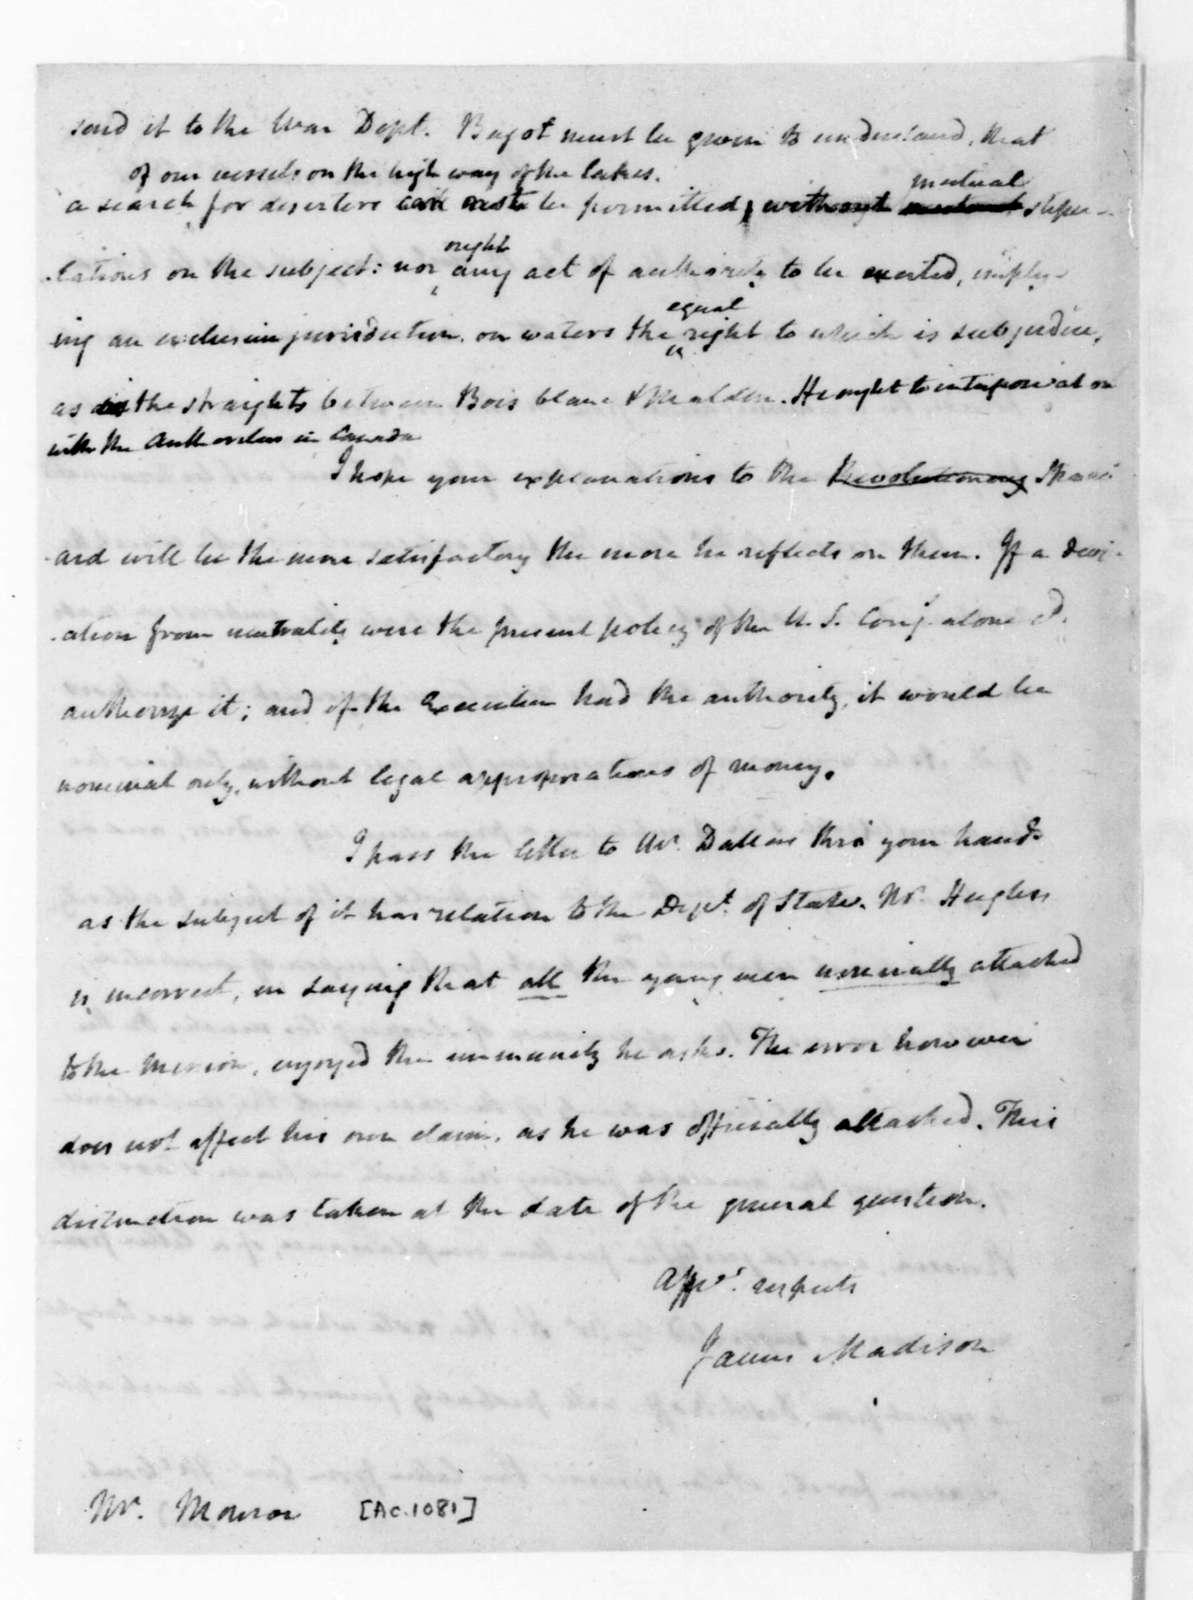 James Madison to James Monroe, August 15, 1816.